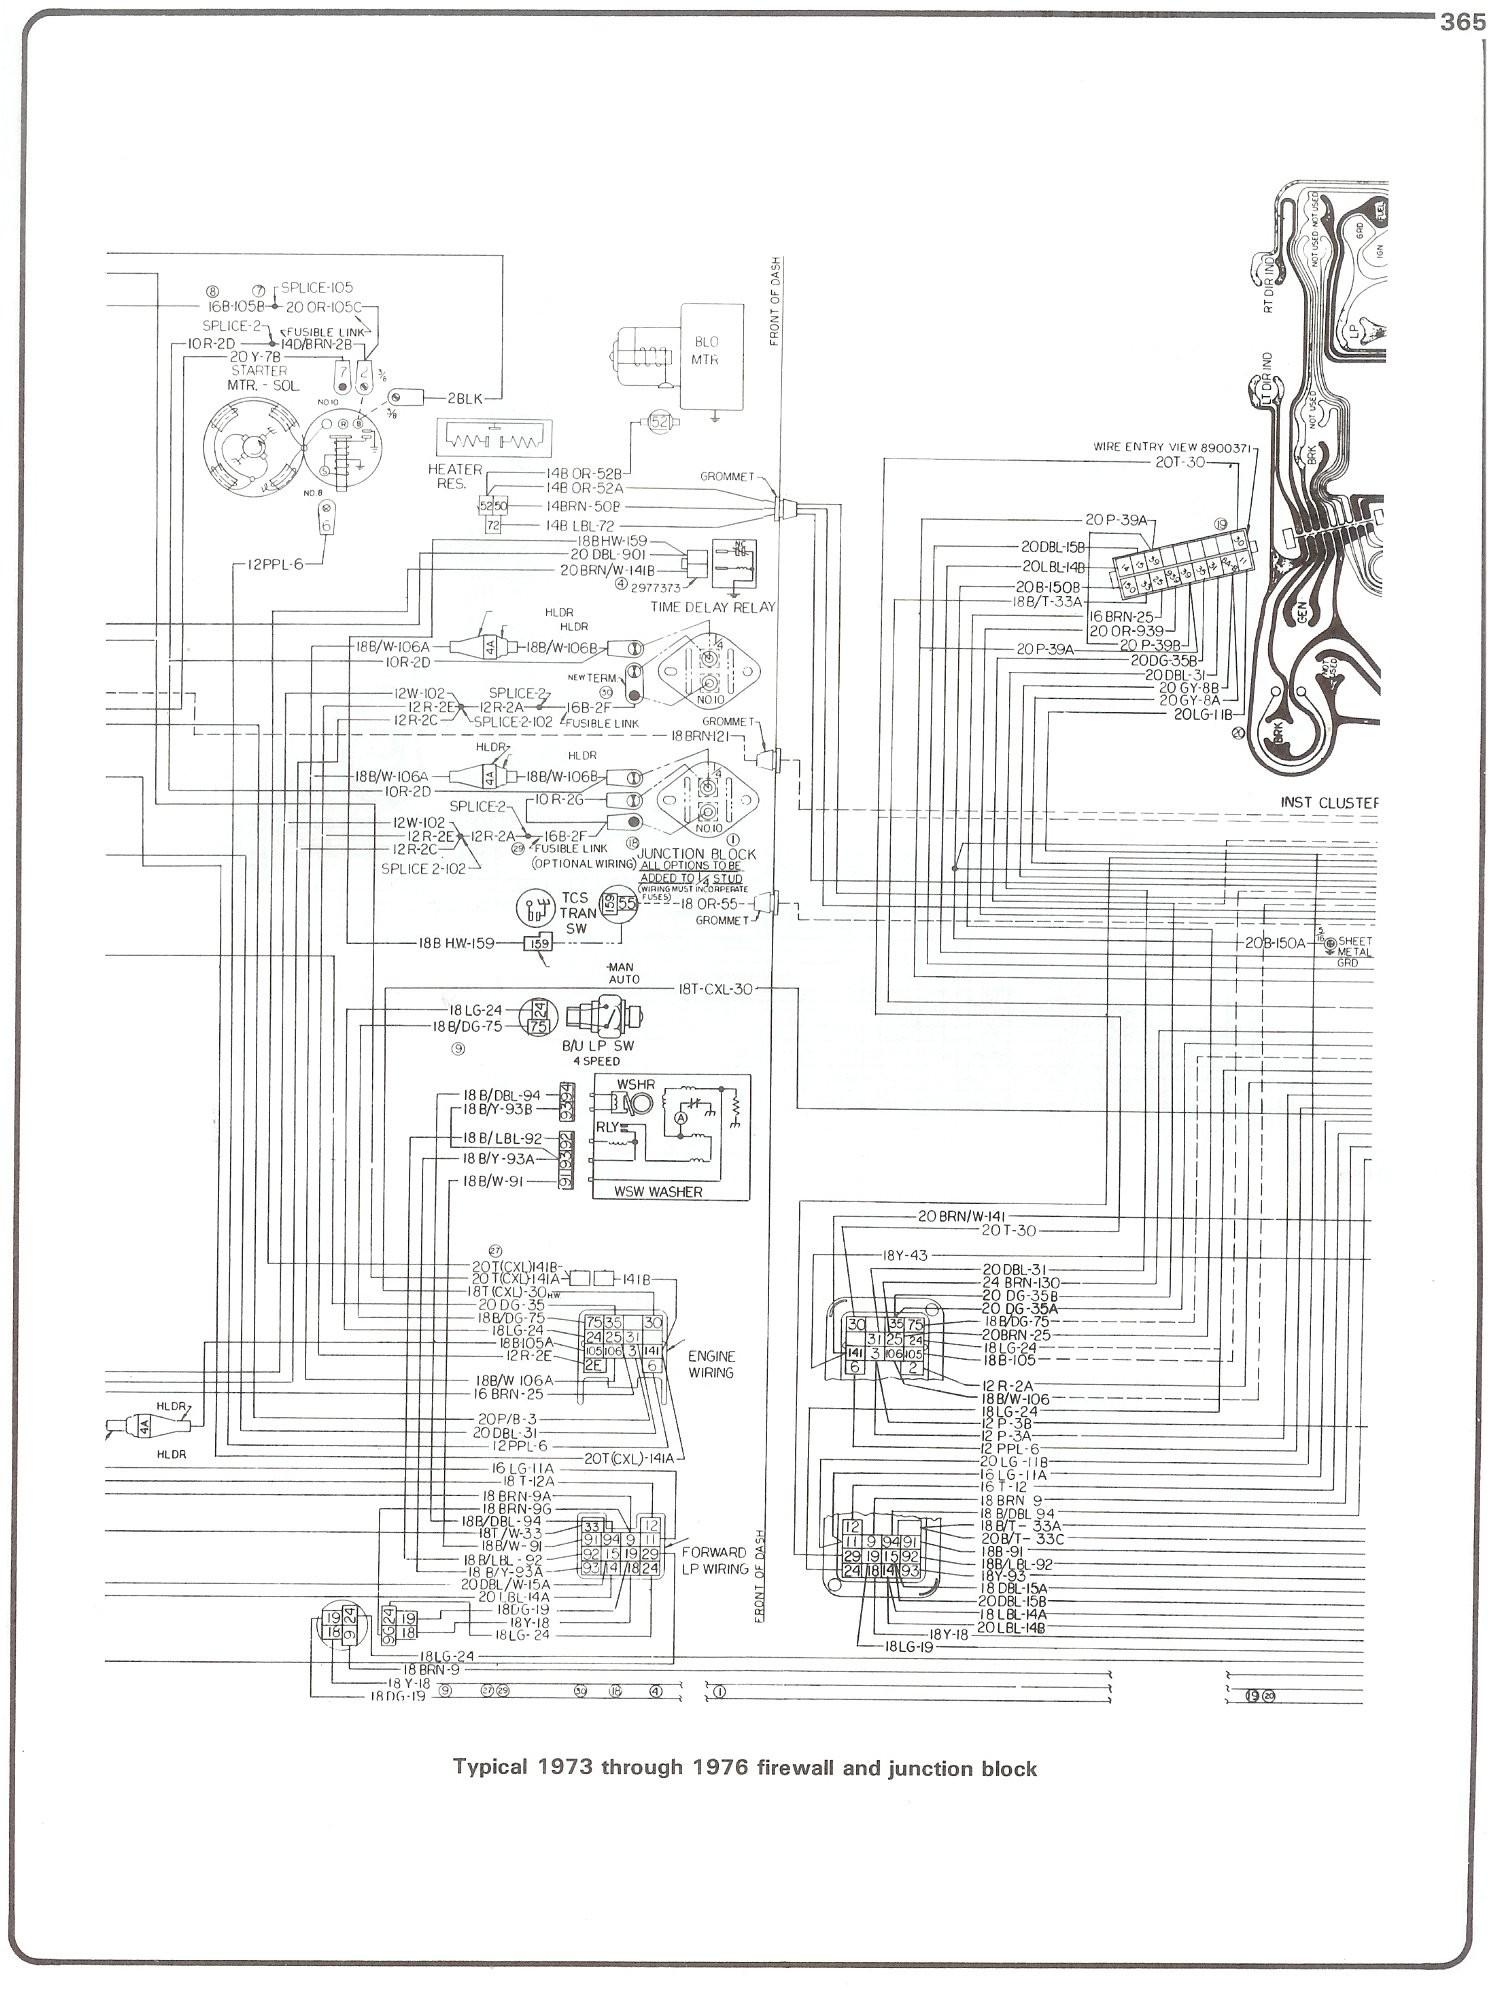 Wiring Diagram for Predator 420cc Ohv Cc3d Diagram Of Wiring Diagram for Predator 420cc Ohv